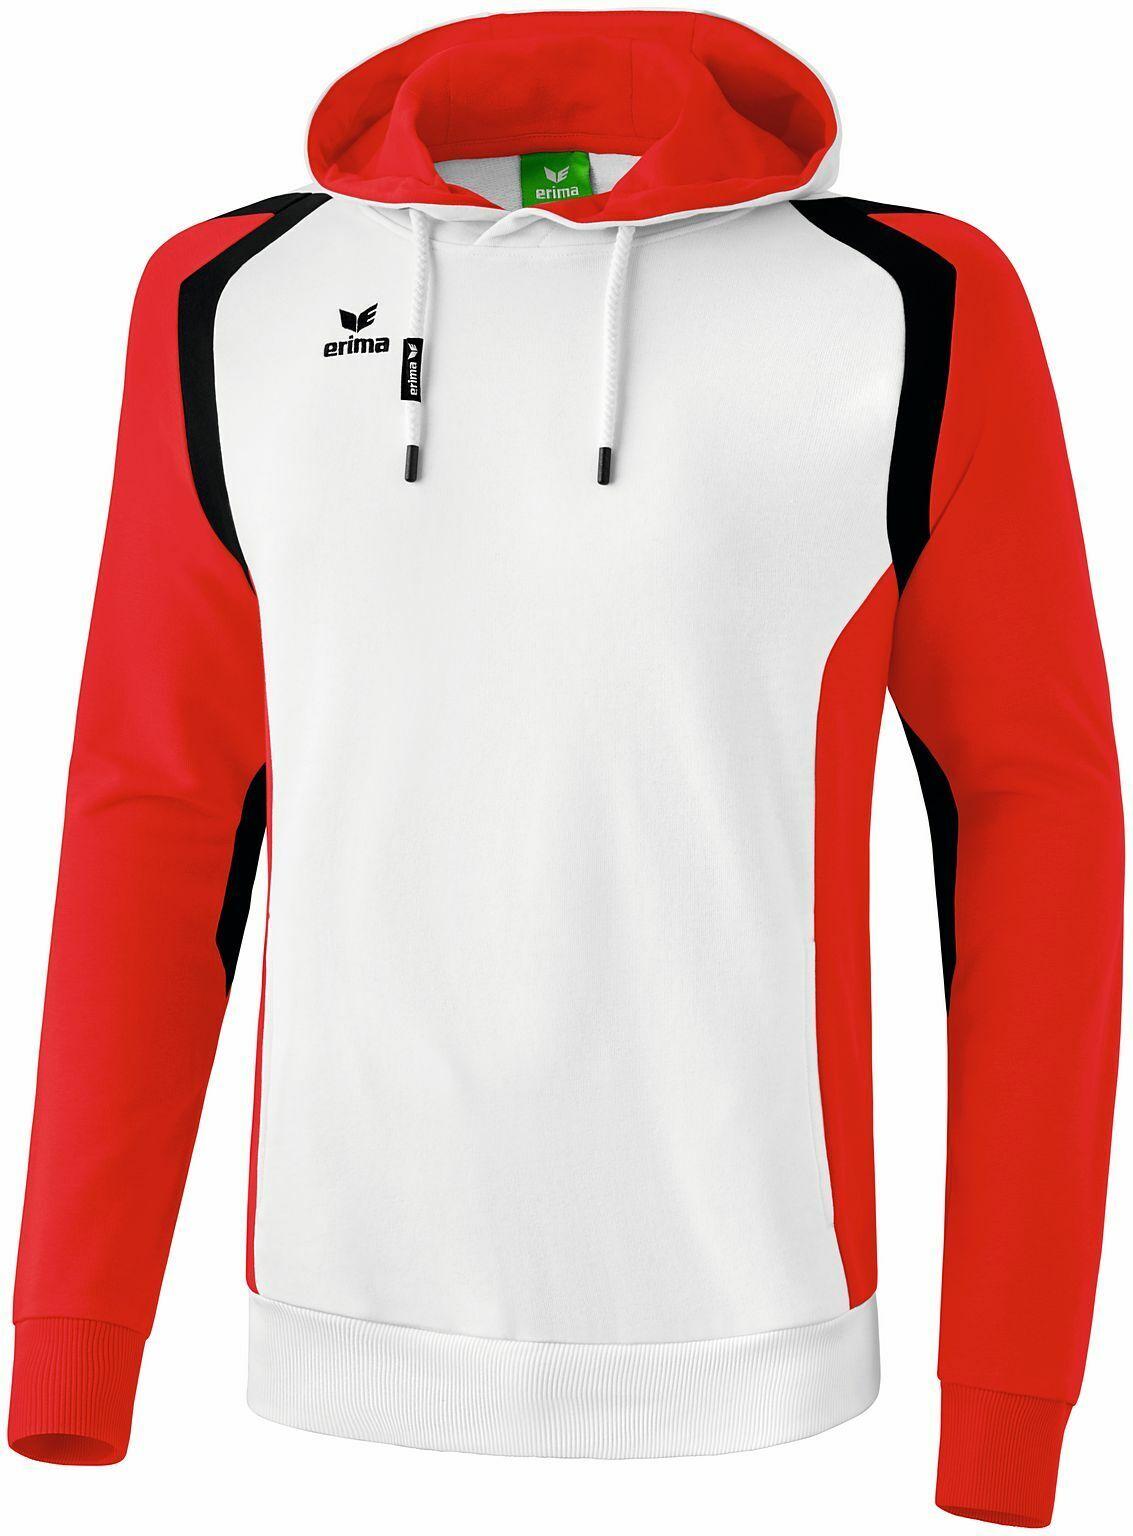 Erima Hoodie Razor 2.0 Kapuzensweatshirt Sweatshirt Hoody Damen Herren Kinder